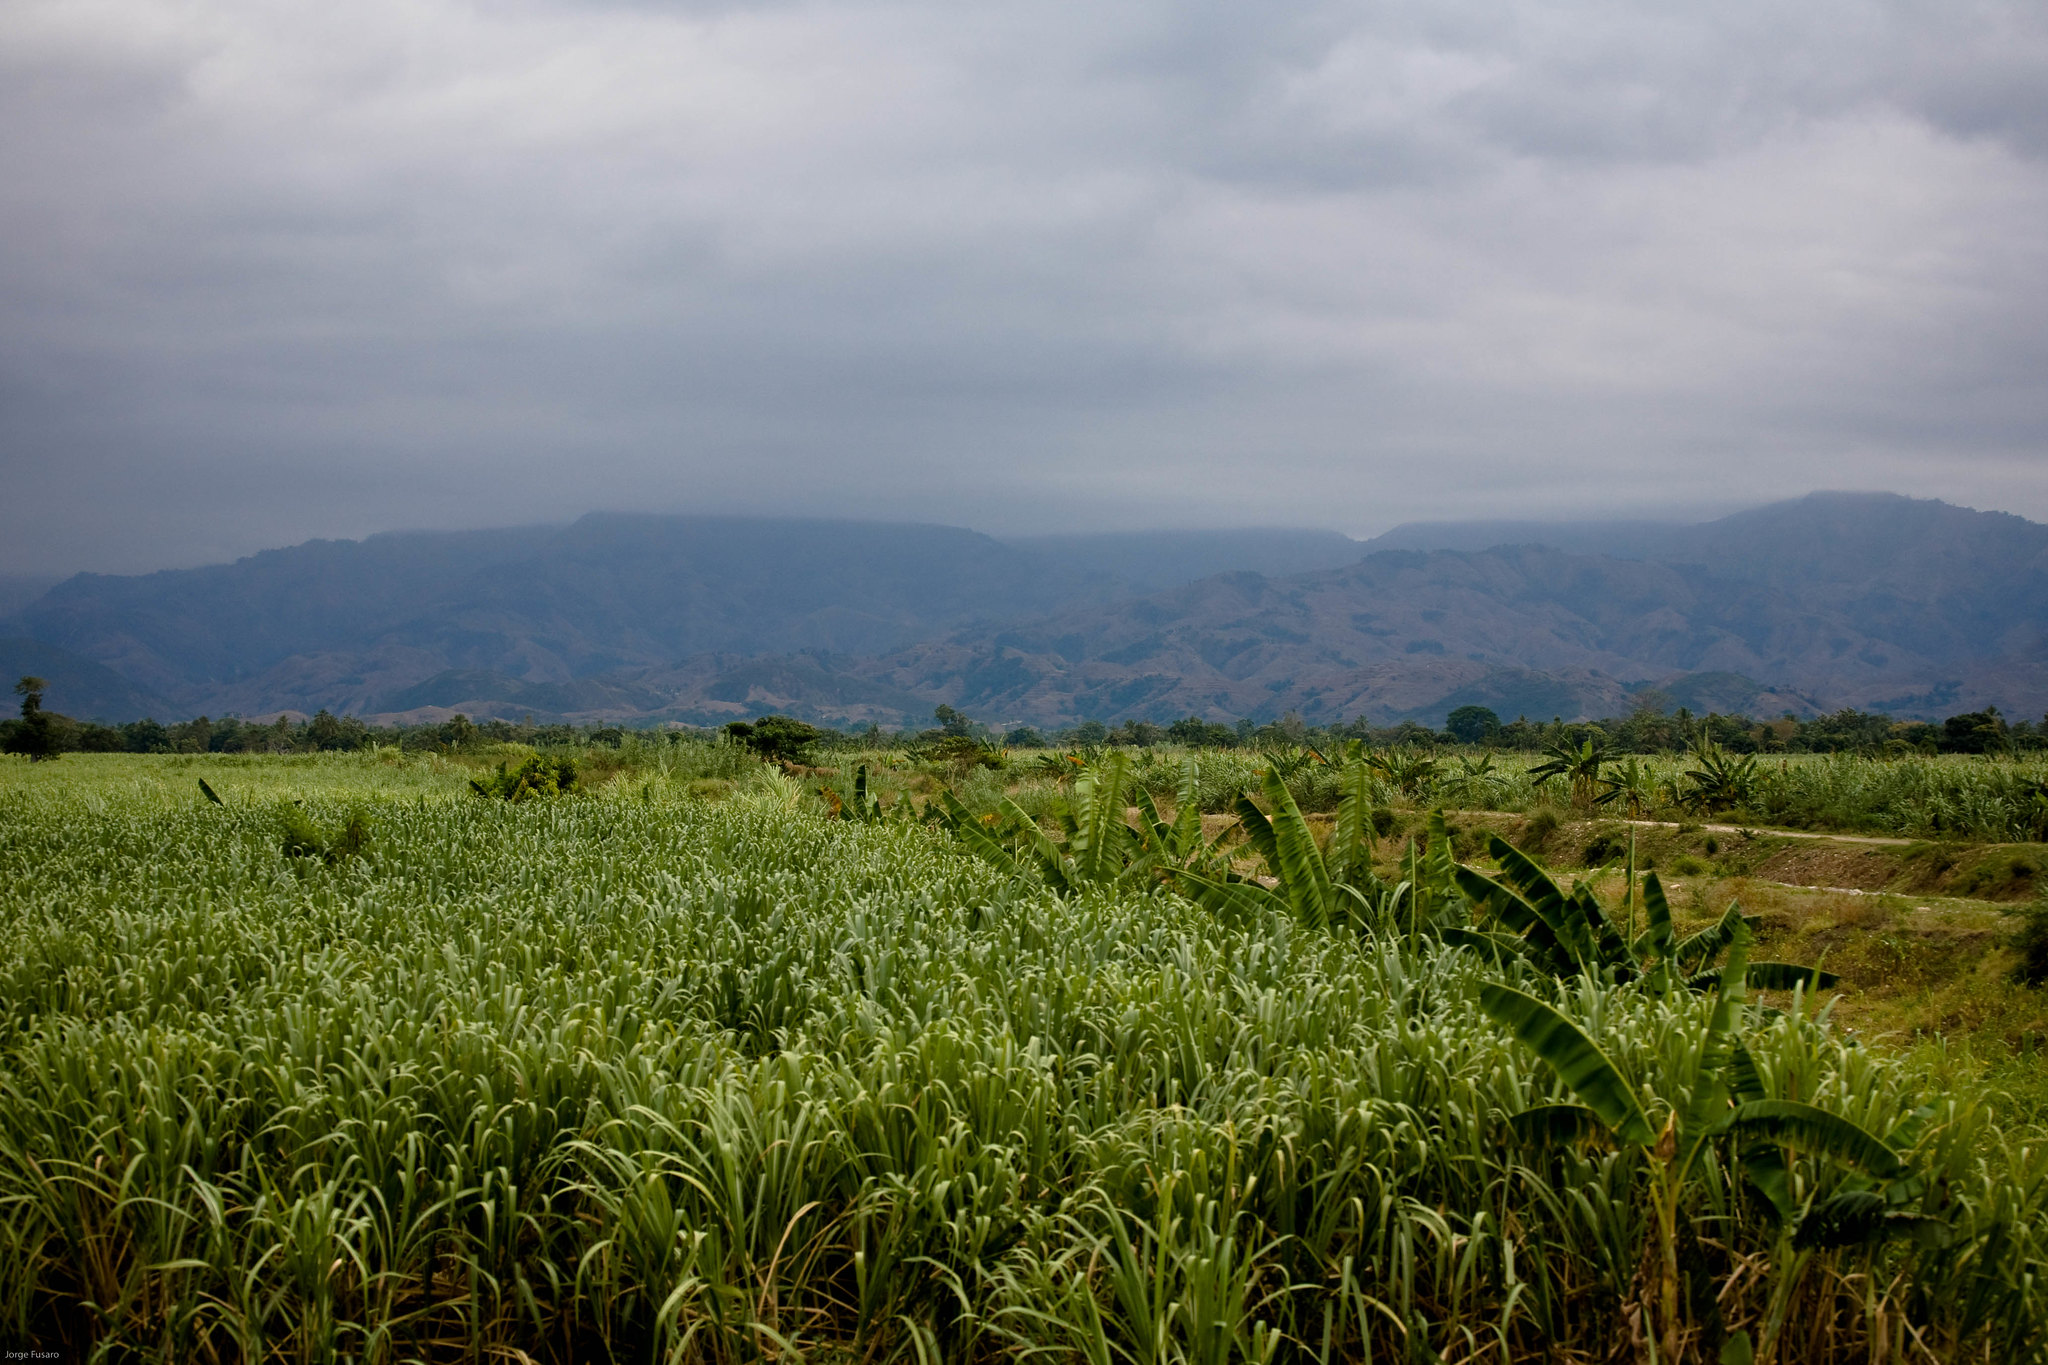 Haitian Garden and landscape